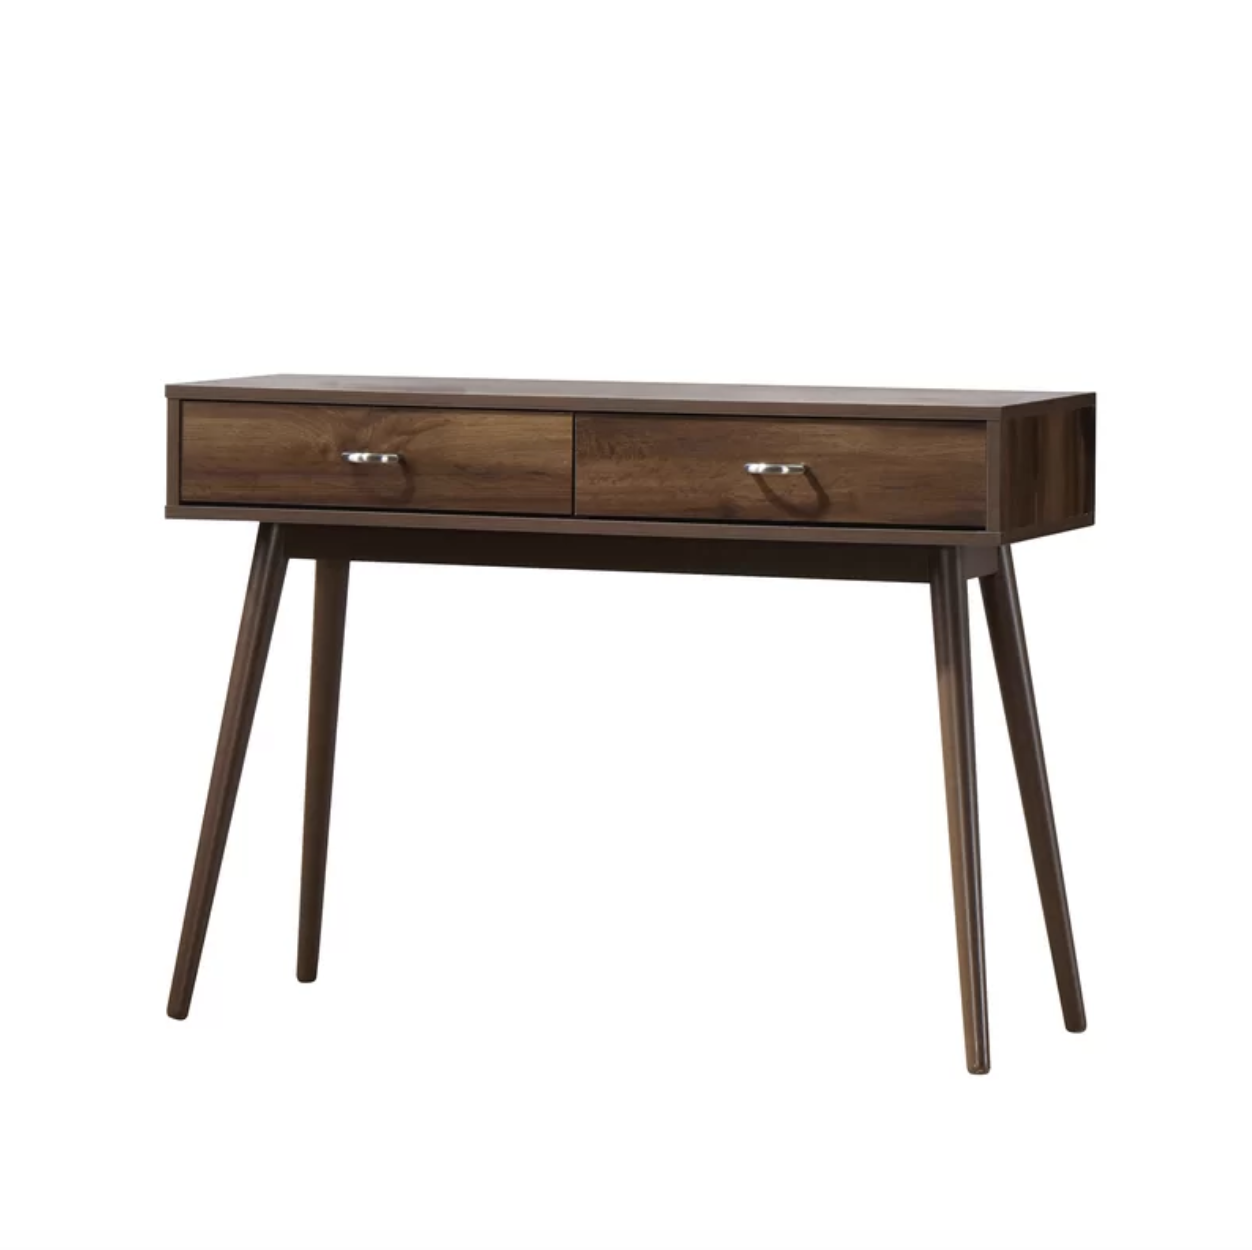 Joss & Main Writing Desk - $135